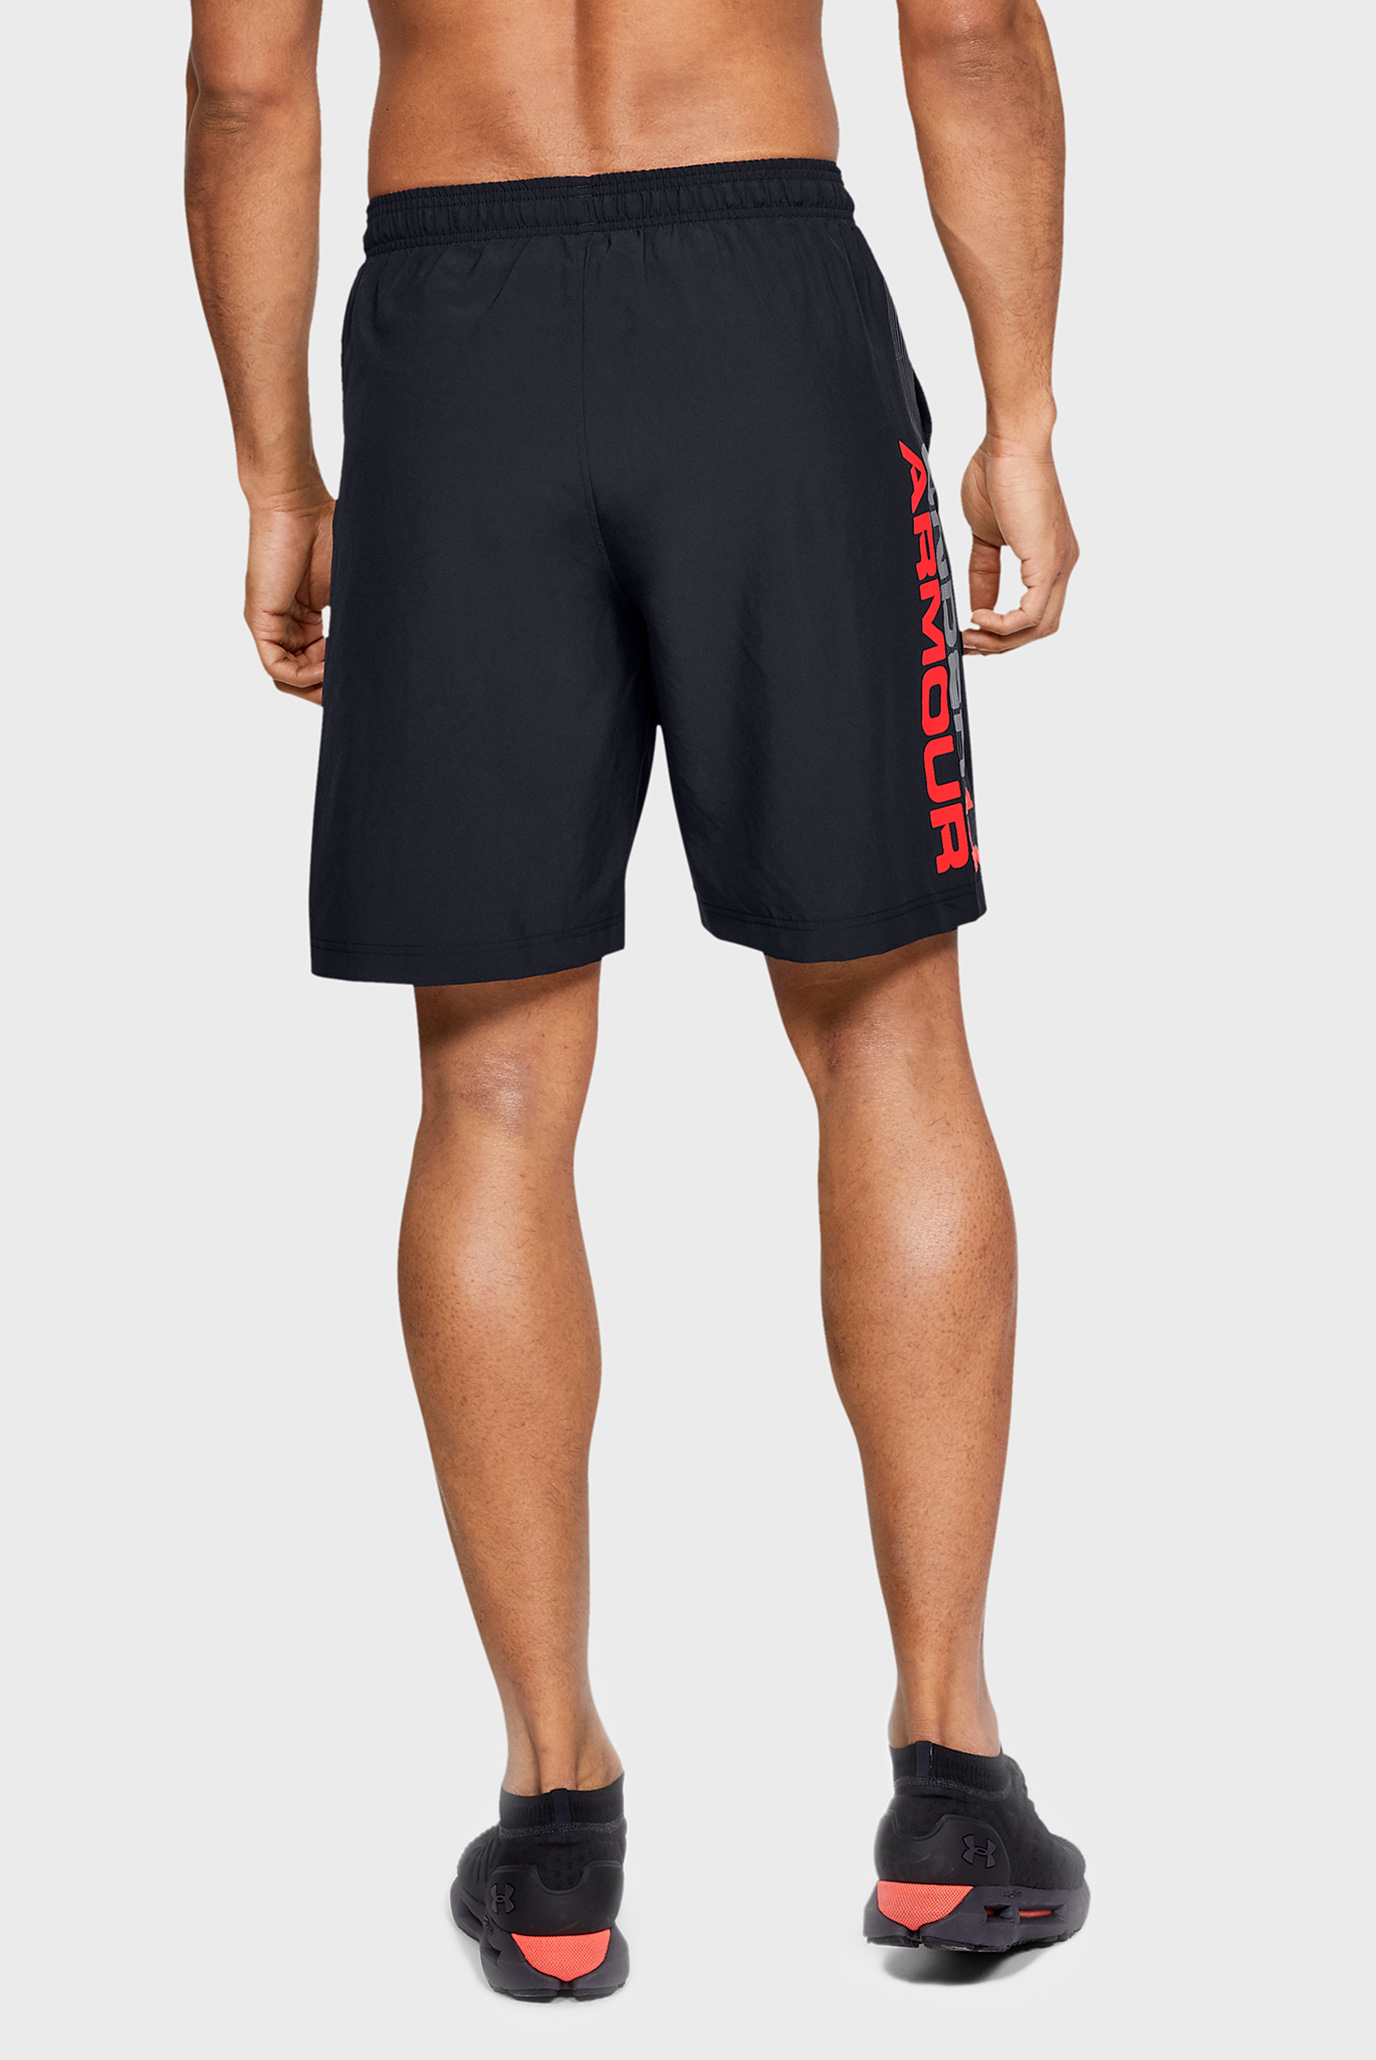 Мужские черные шорты Woven Graphic Wordmark Shorts-BLK Under Armour